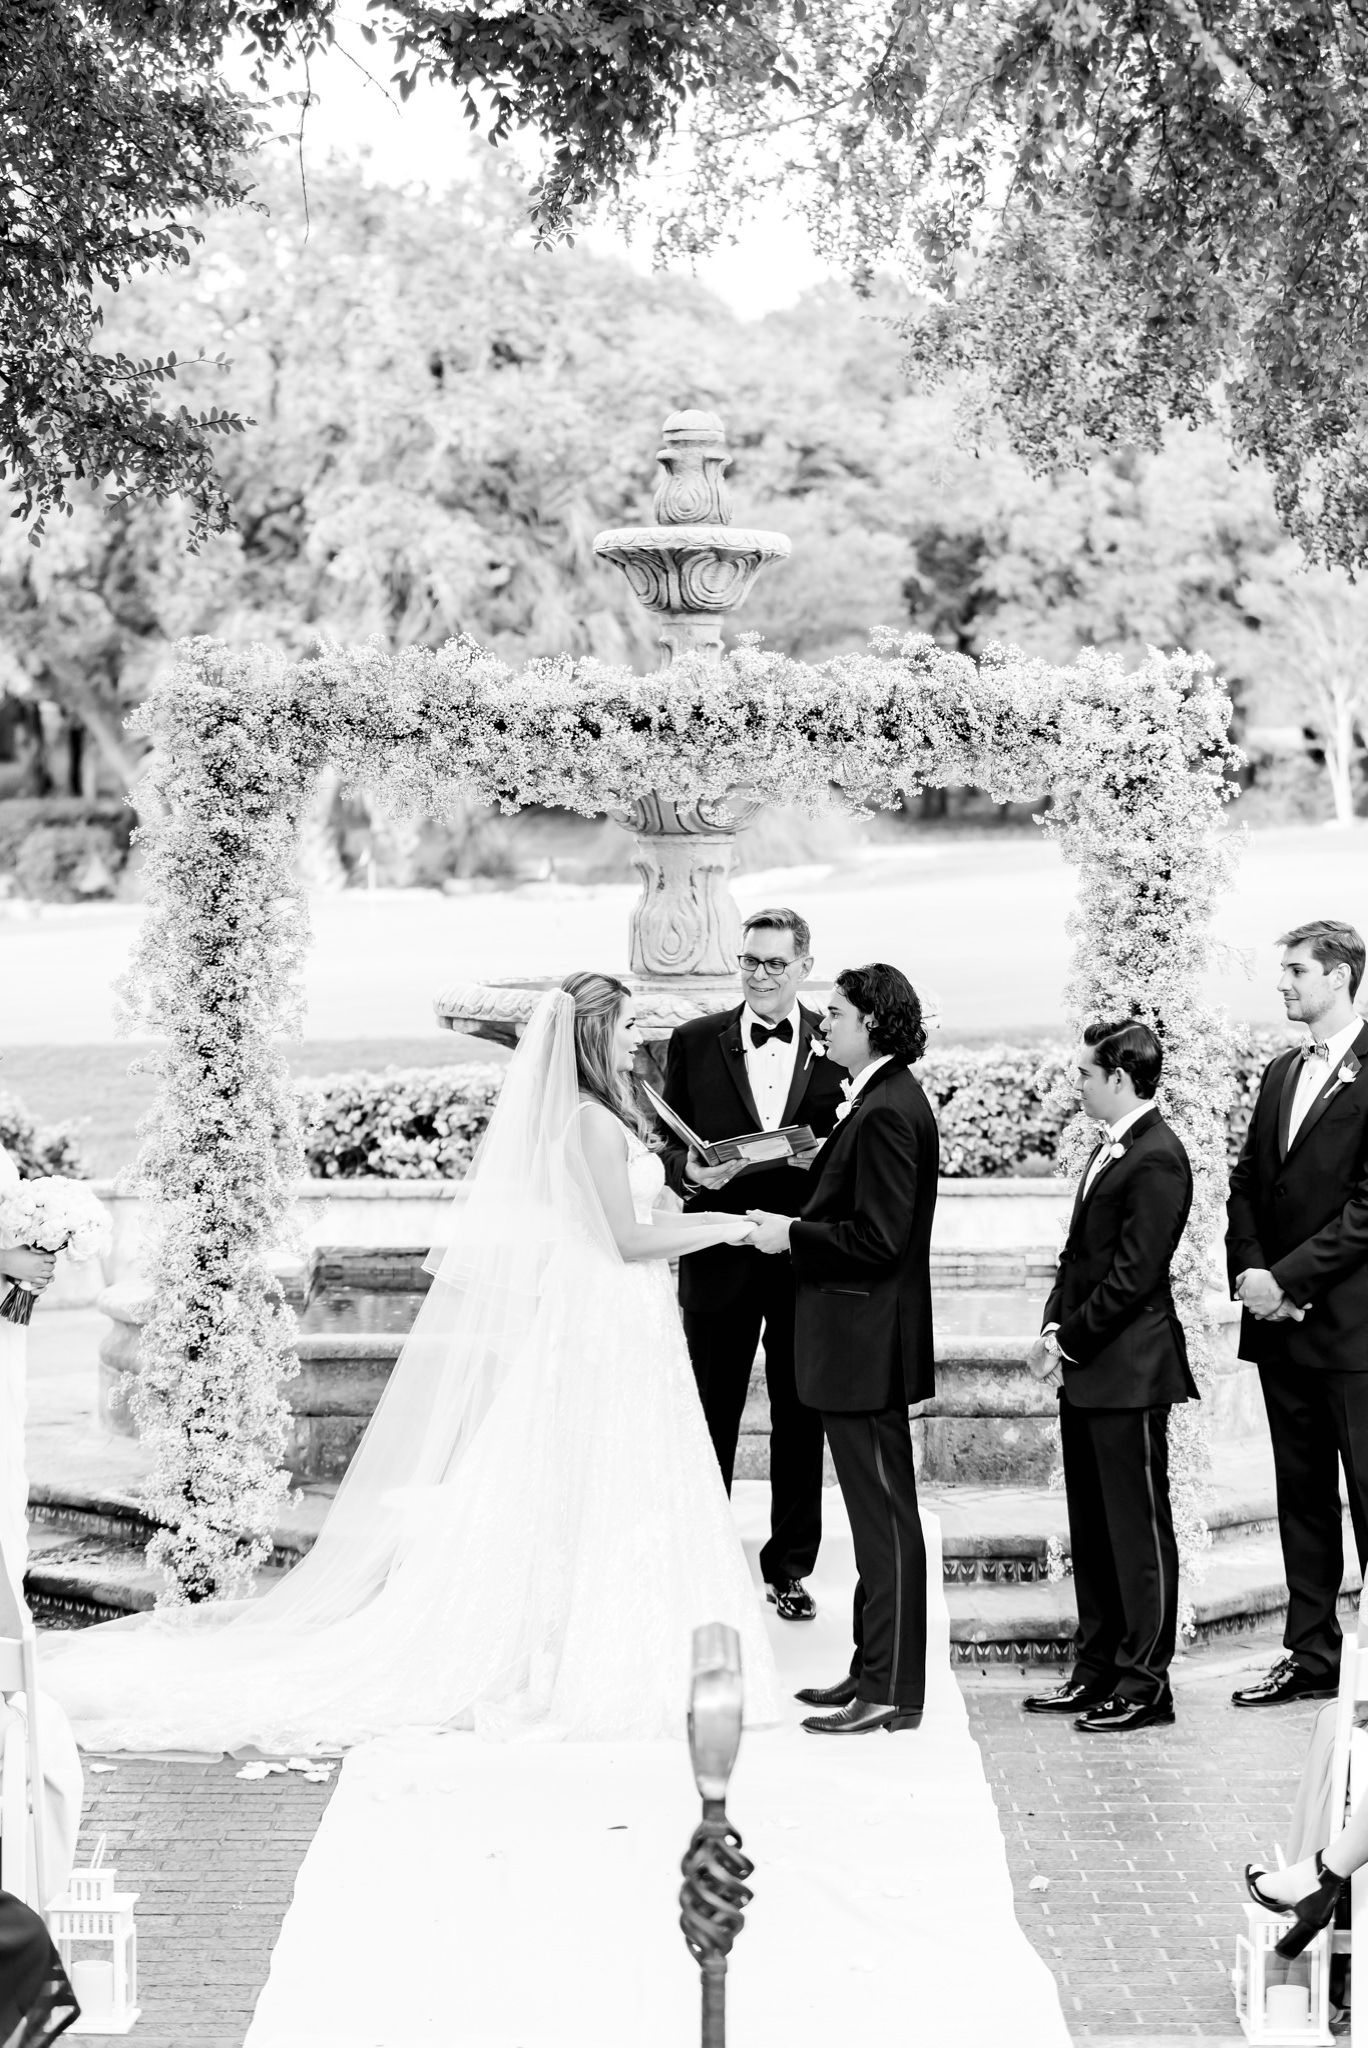 50+ San antonio wedding photography videography info